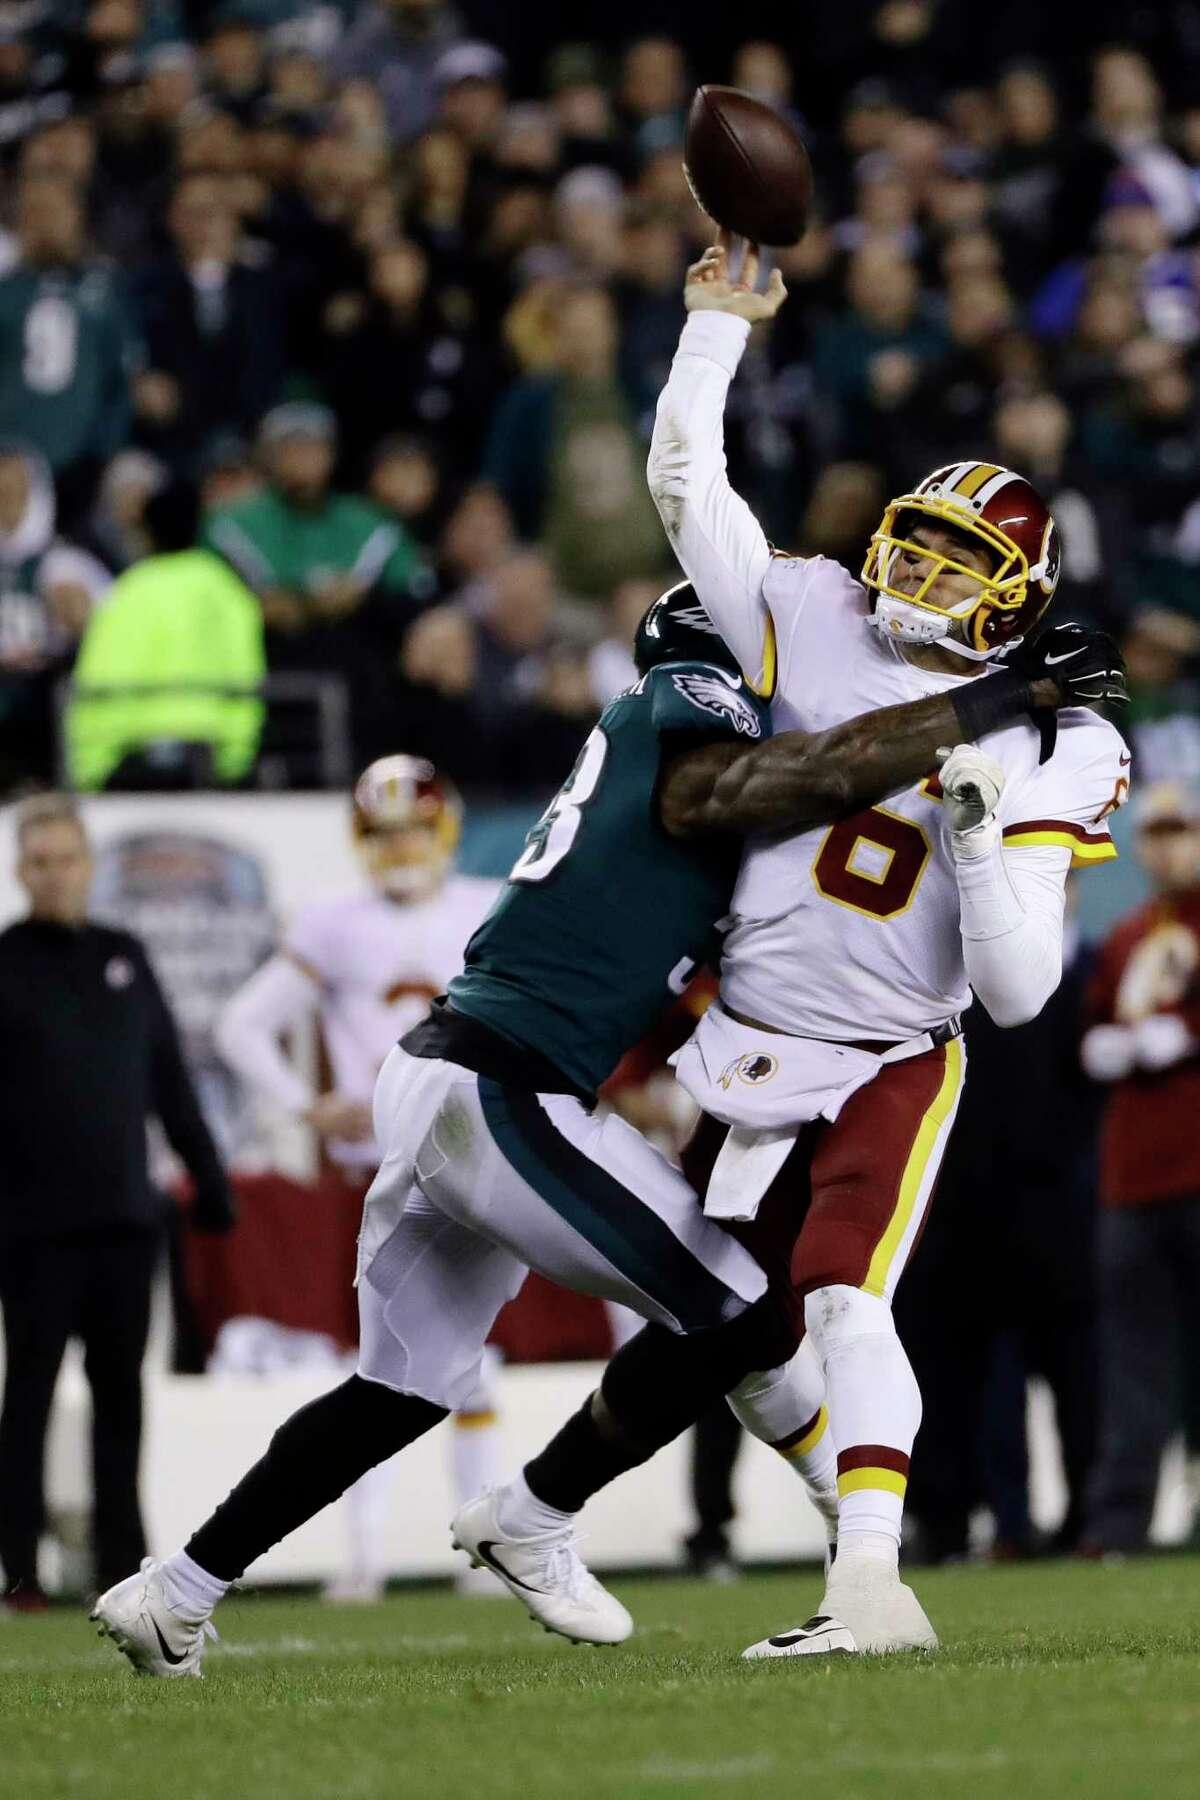 Washington Redskins' Mark Sanchez (6) is hit by Philadelphia Eagles' Nigel Bradham (53) during the first half of an NFL football game, Monday, Dec. 3, 2018, in Philadelphia.